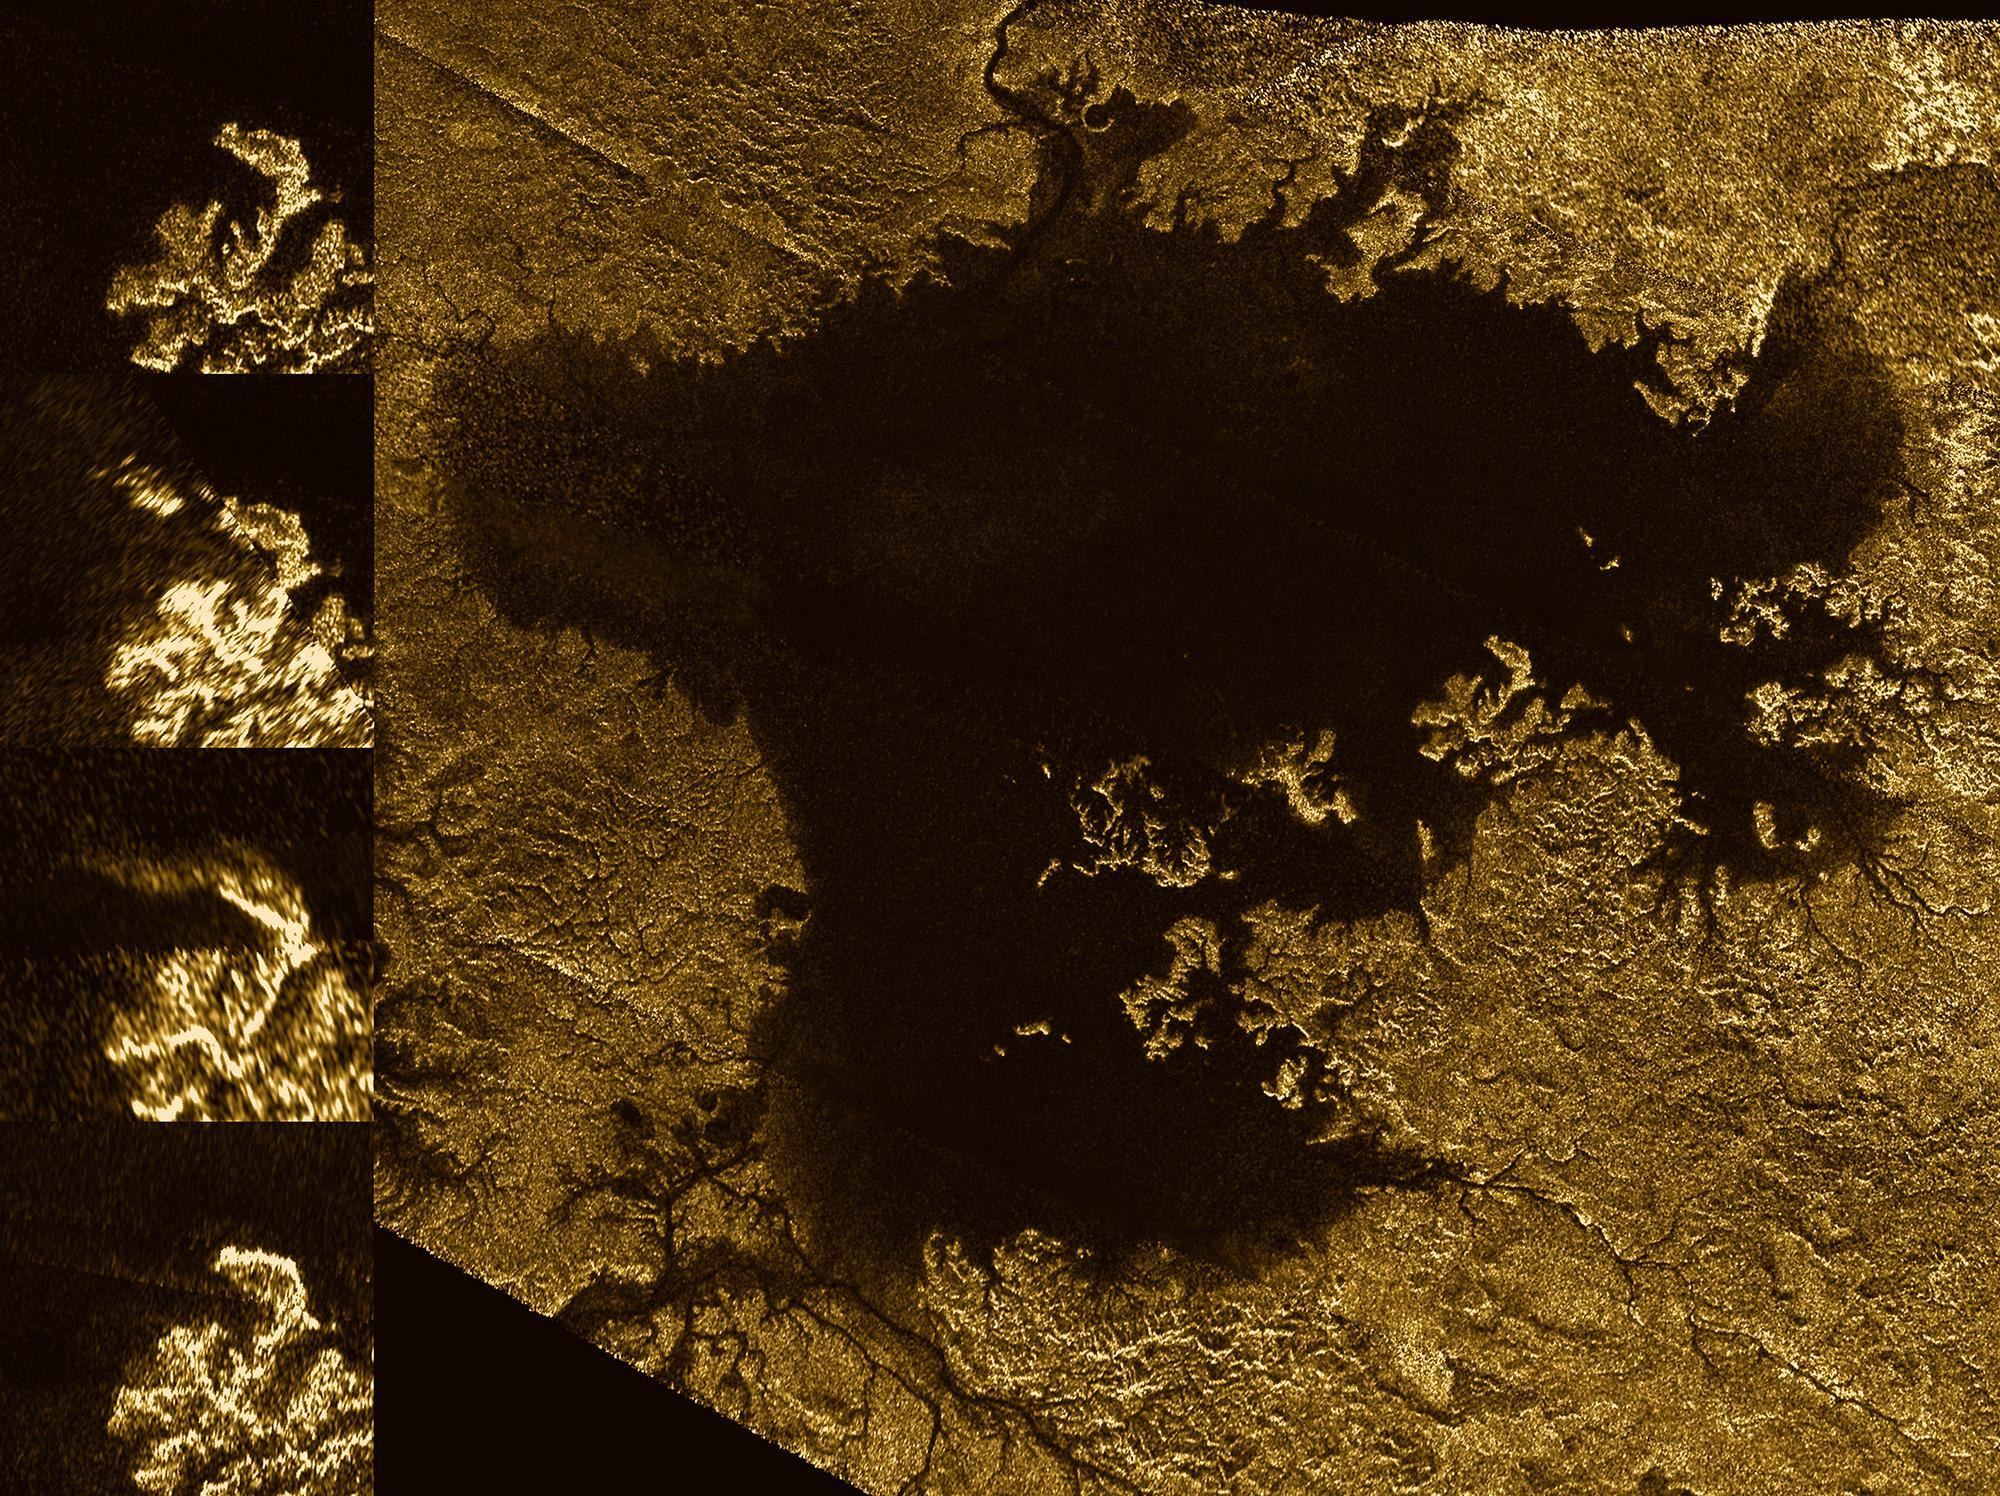 Обнаруженный спутник Сатурна похож напельмень